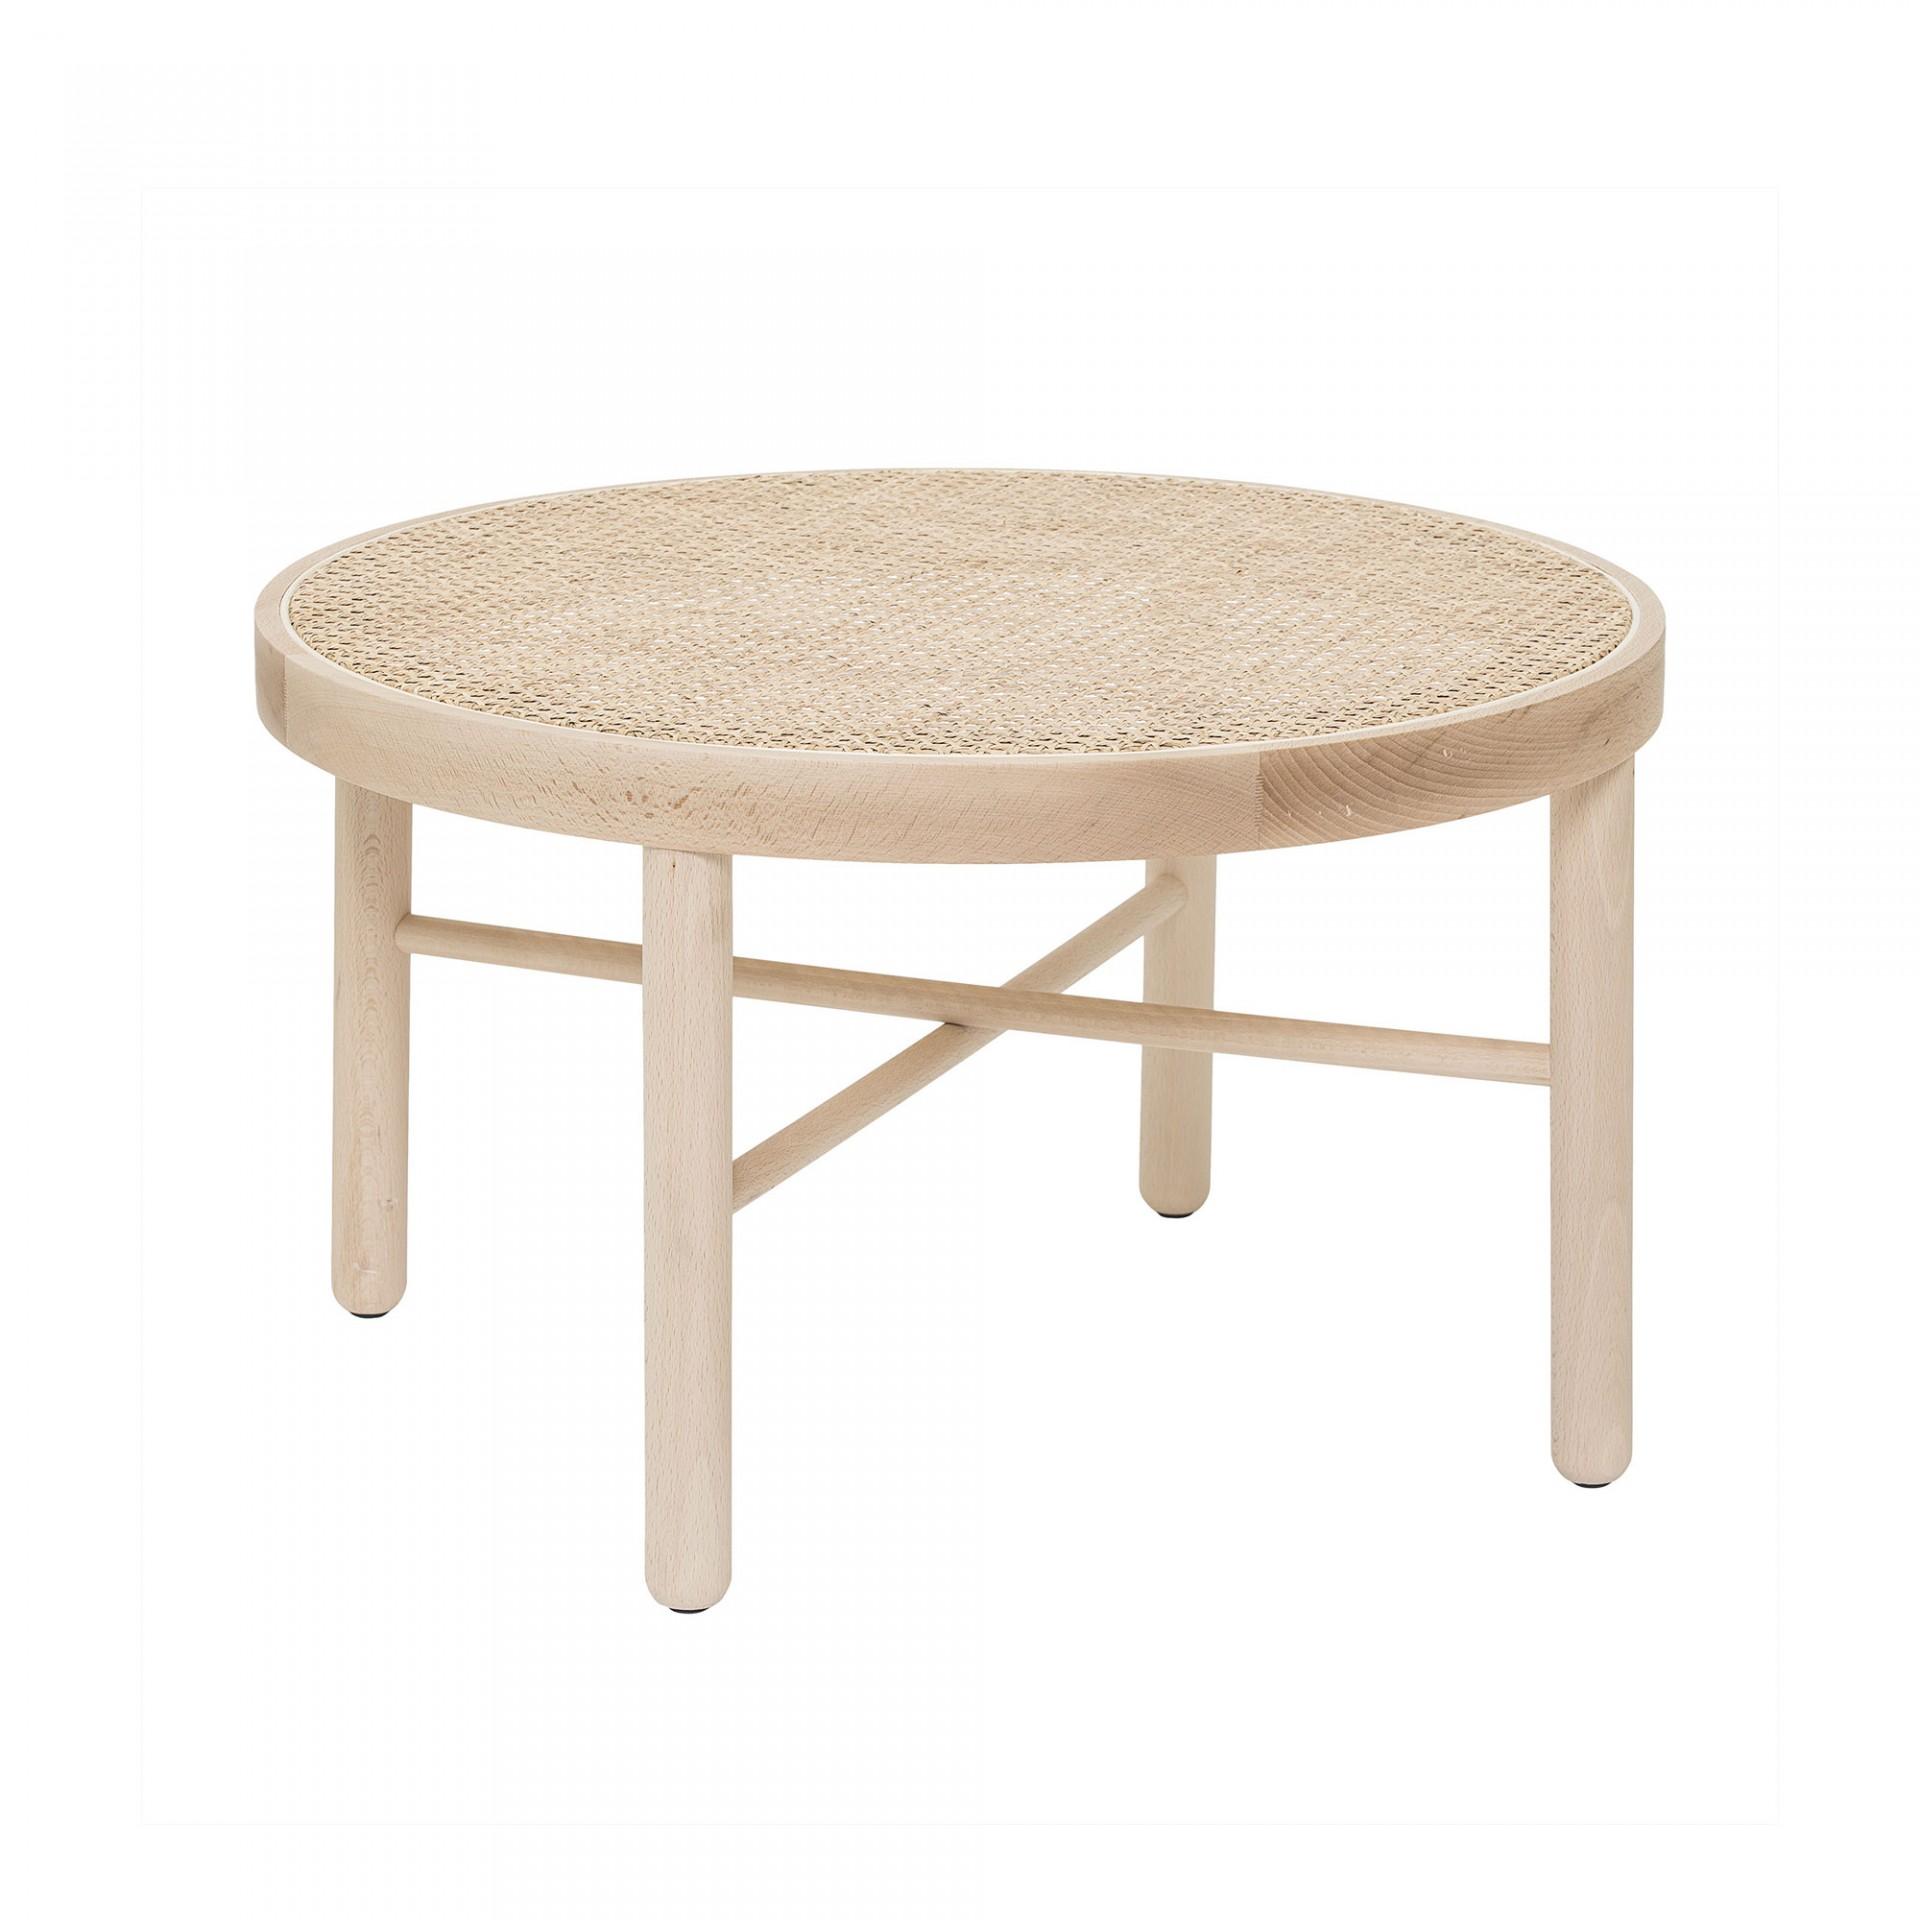 Mesa de centro Luna, madeira faia/vime natural, Ø70x40cm